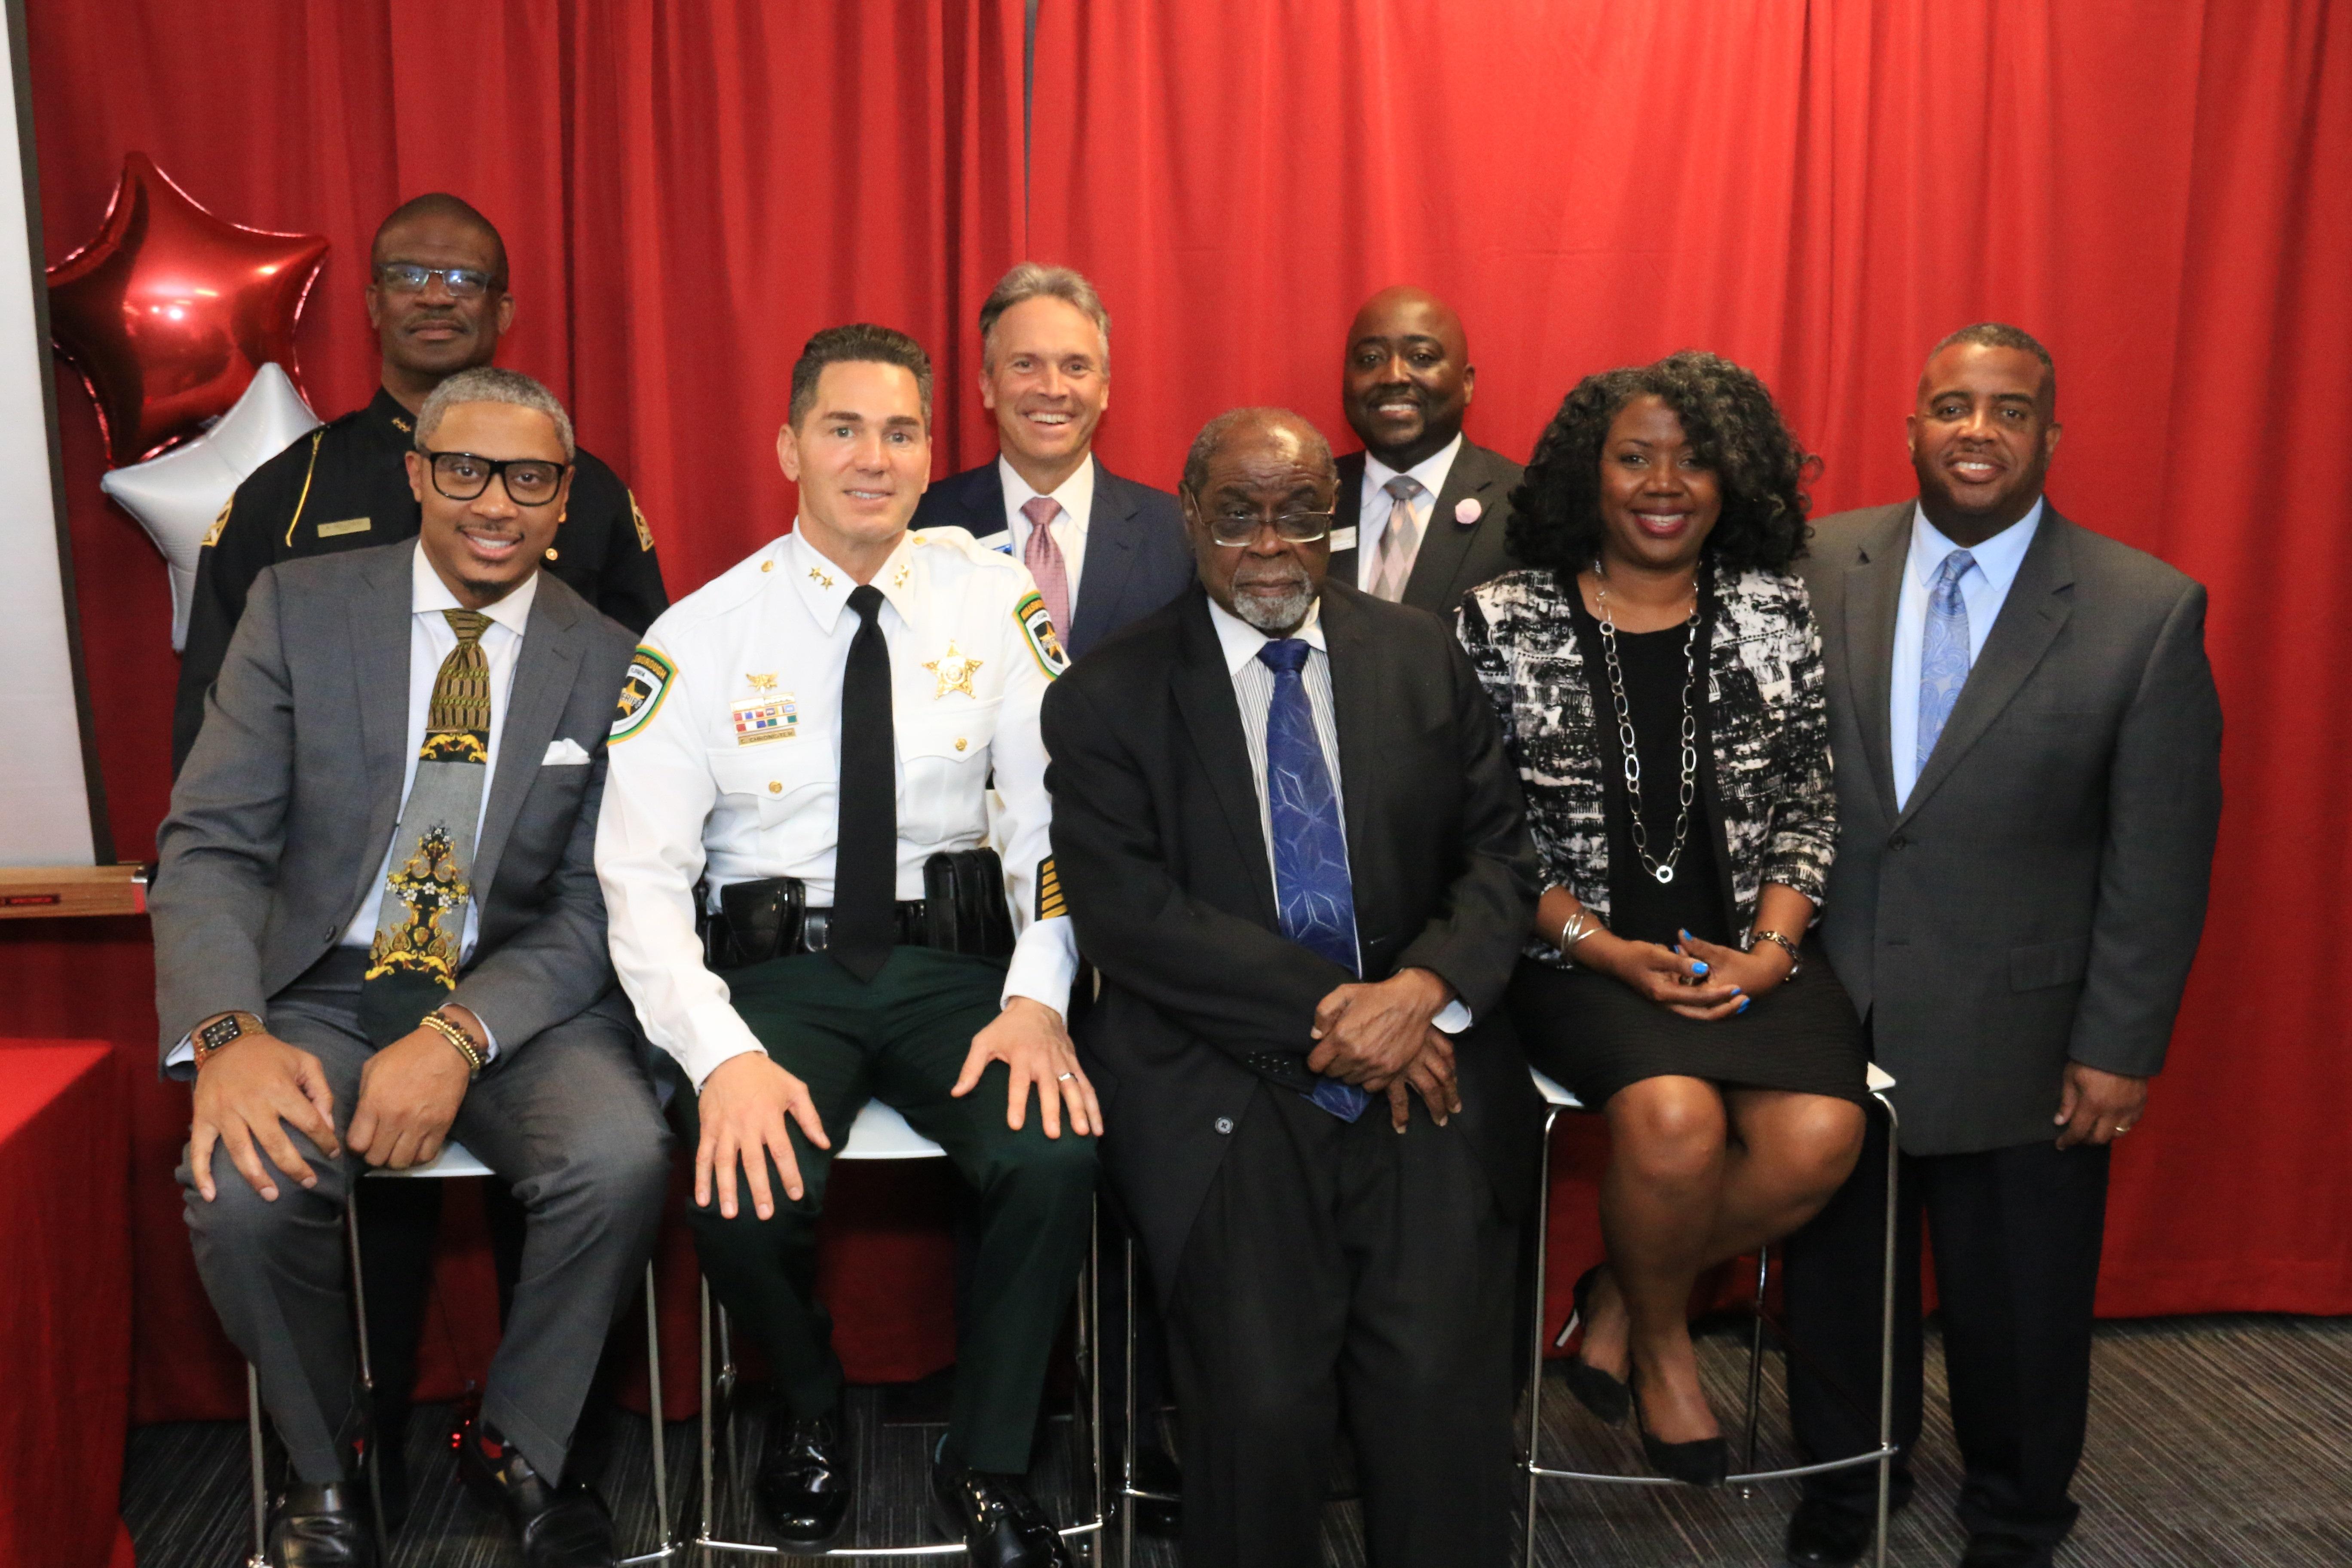 BLACK PROFESSIONAL GROUP CELEBRATES BLACK HISTORY MONTH